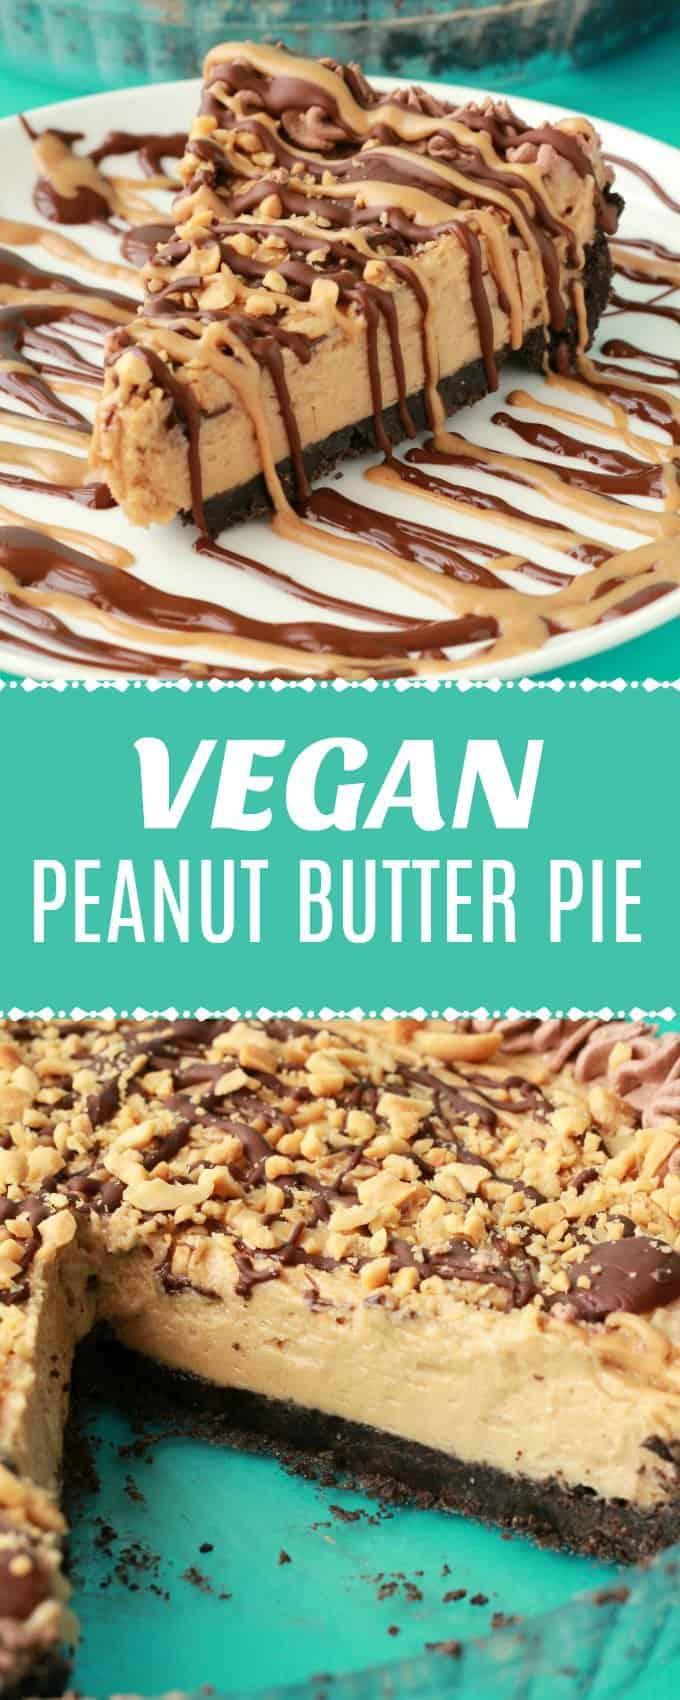 Vegan Peanut Butter Pie. Purely irresistible no-bake vegan pie with an oreo cookie crust, creamy peanut butter filling and drizzled peanut butter and chocolate topping! | lovingitvegan.com